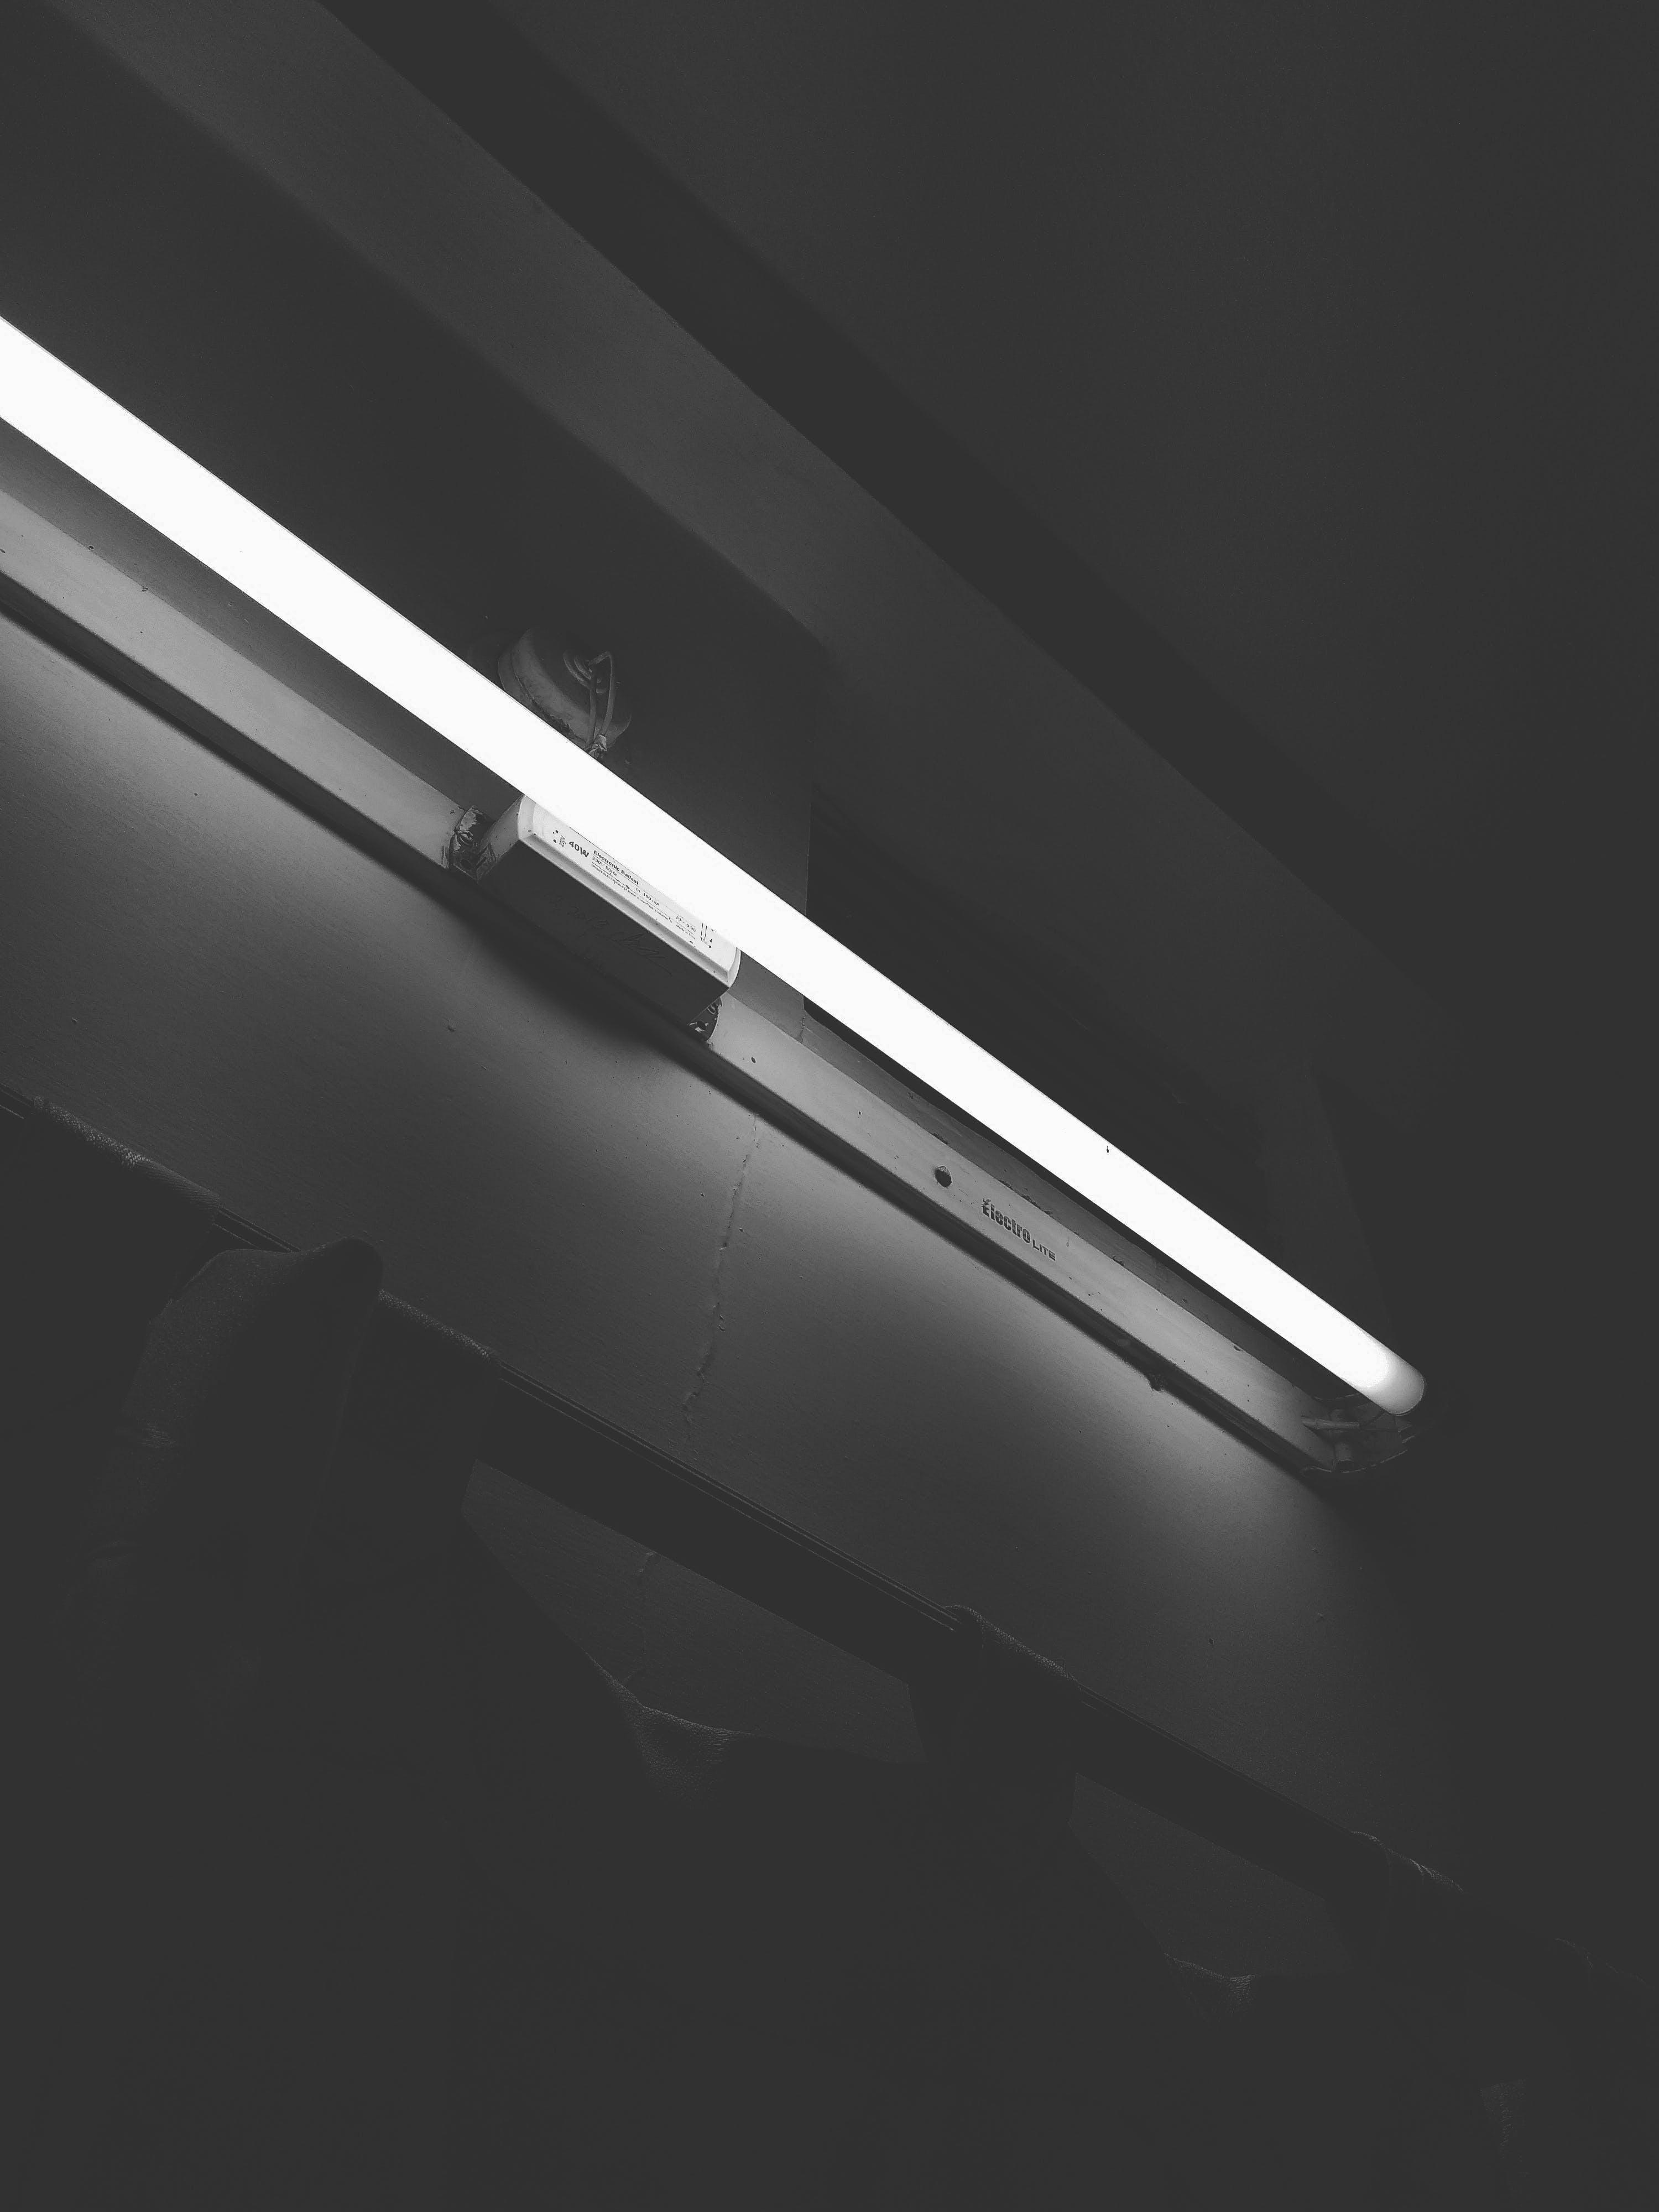 Turned on Fluorescent Tube